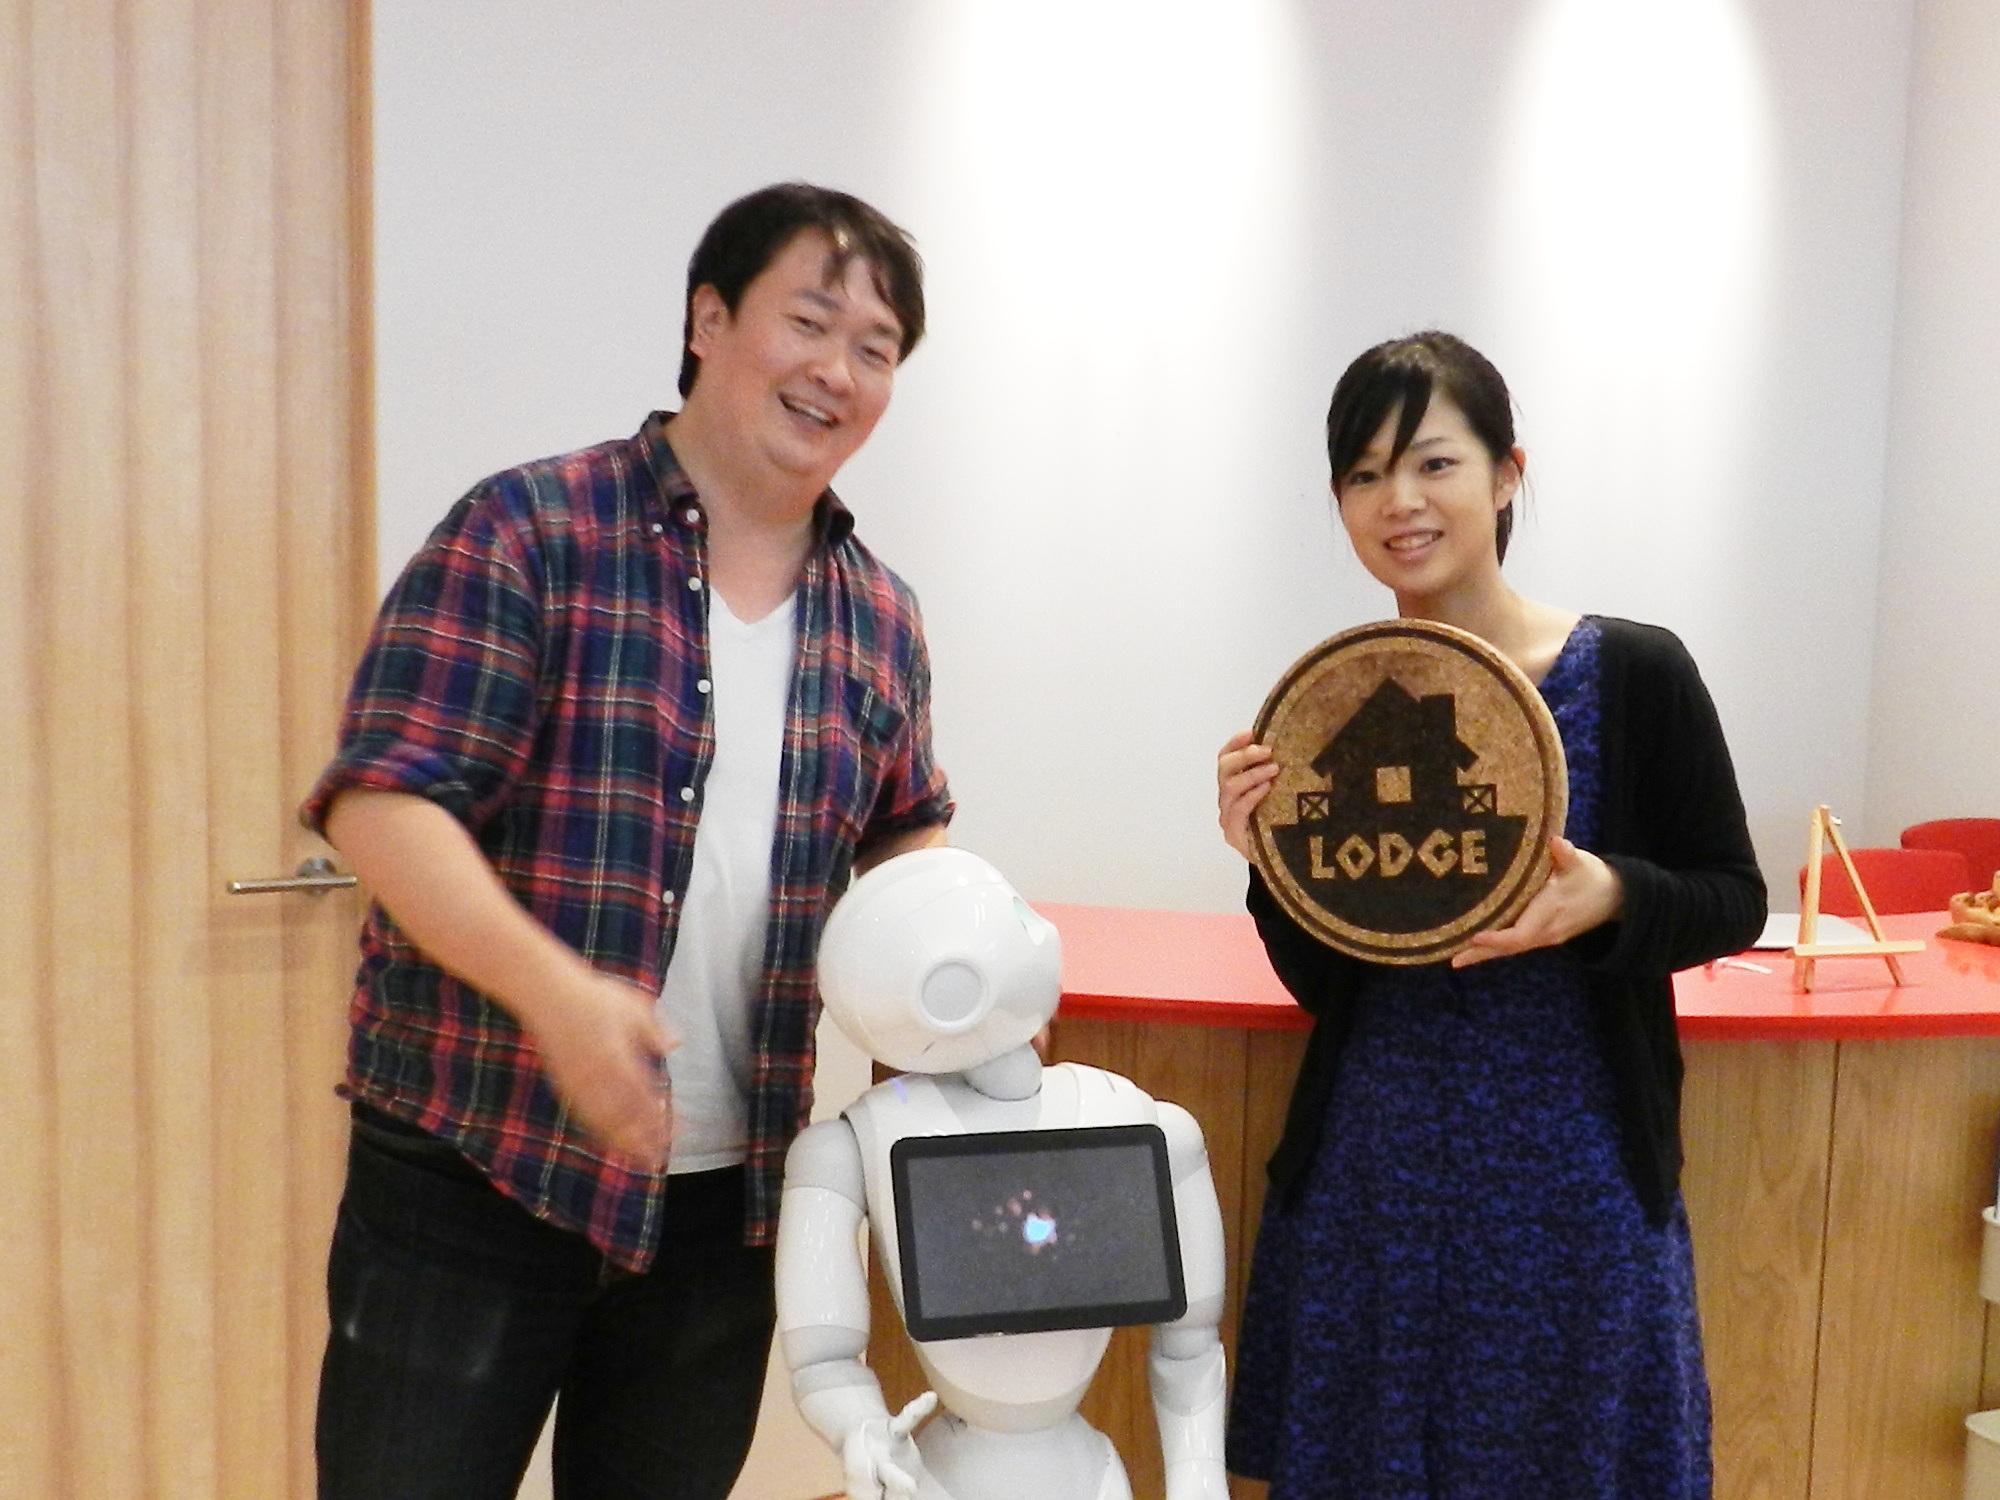 Yahoo! JAPANが11月から運営開始するコワーキングスペースLODGEに潜入! [突撃取材][第30回]